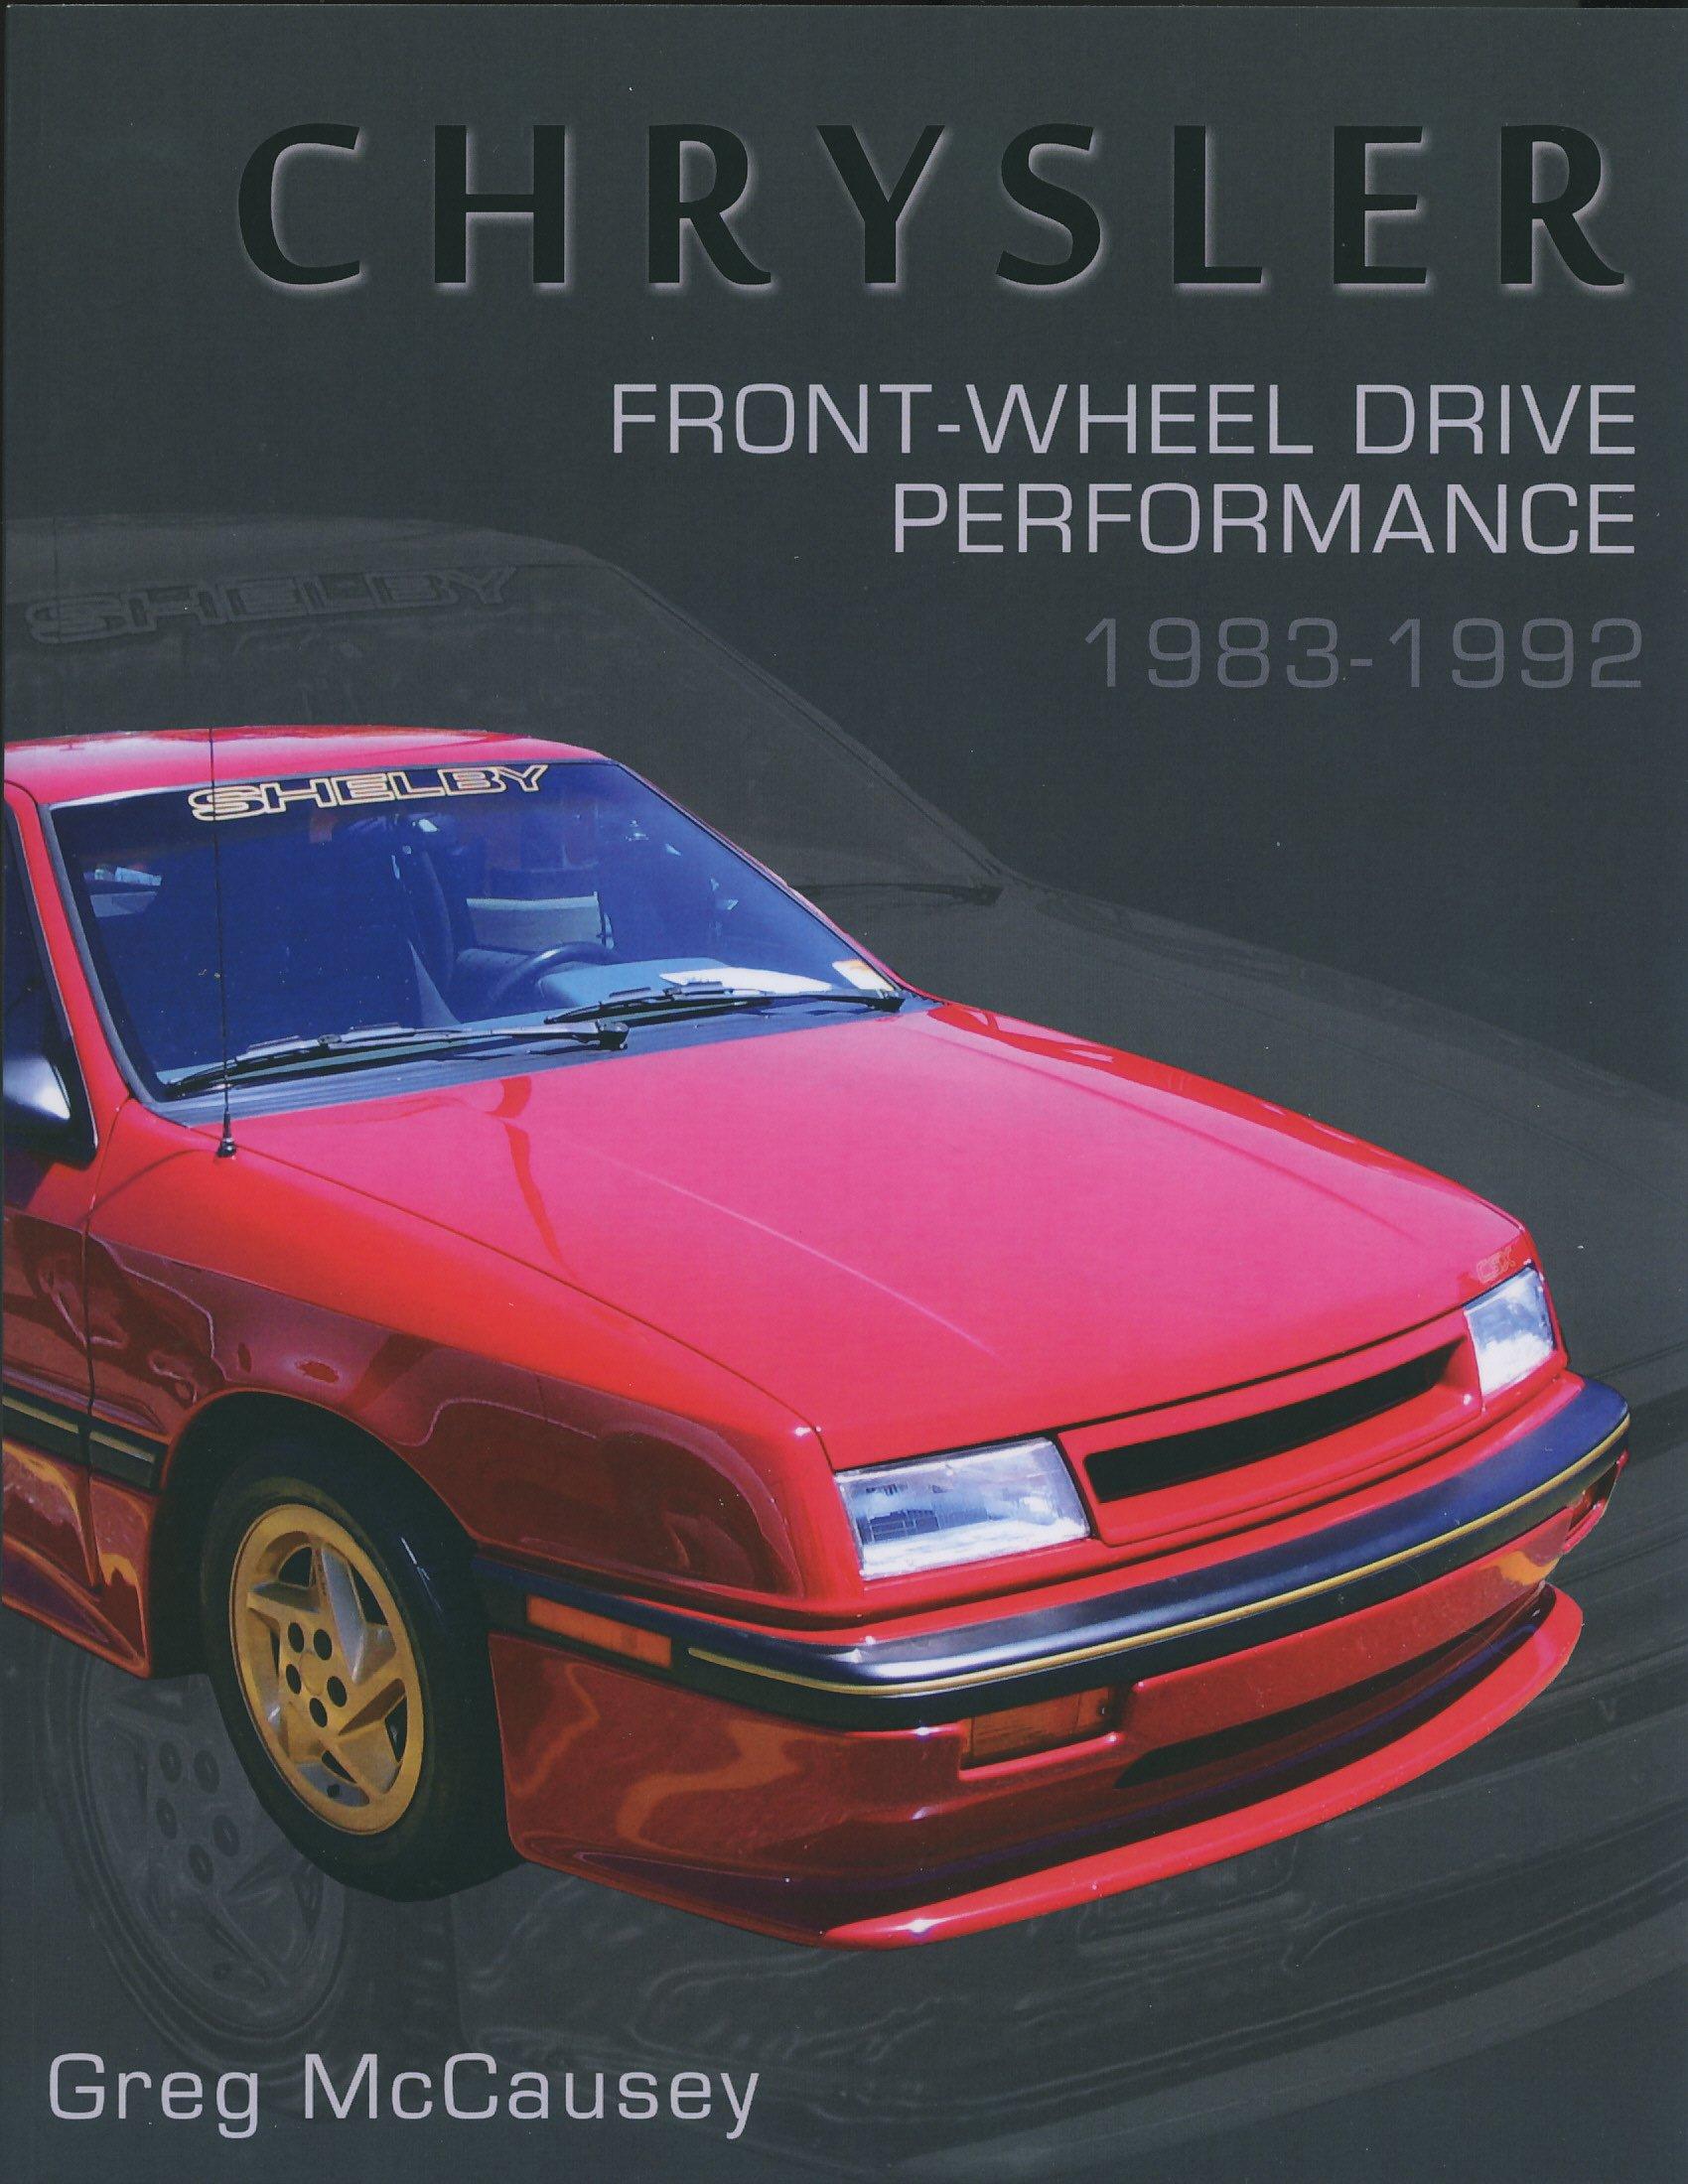 Chrysler Front-Wheel Drive Performance 1983-1992: Amazon.es: Gregory McCausey, Robert, III Meier: Libros en idiomas extranjeros